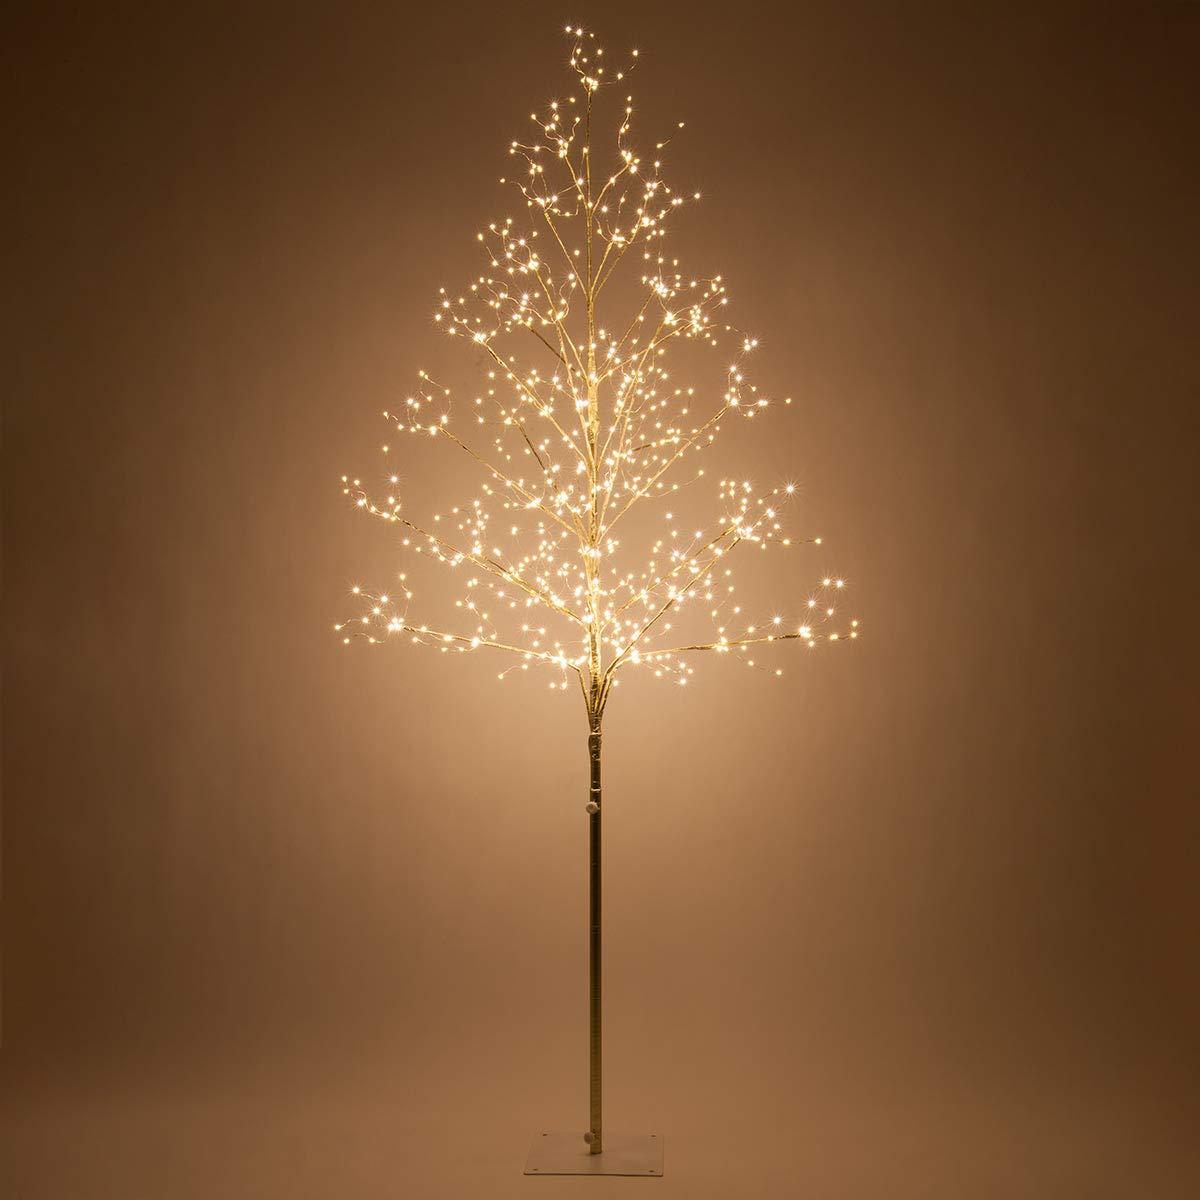 Fairy Light Tree Indoor Outdoor Decor Lighted Tree With Fairy Lights Globe Light Tree Light Ball Tree With Globe Lights 6 Ft Gold Fairy Light